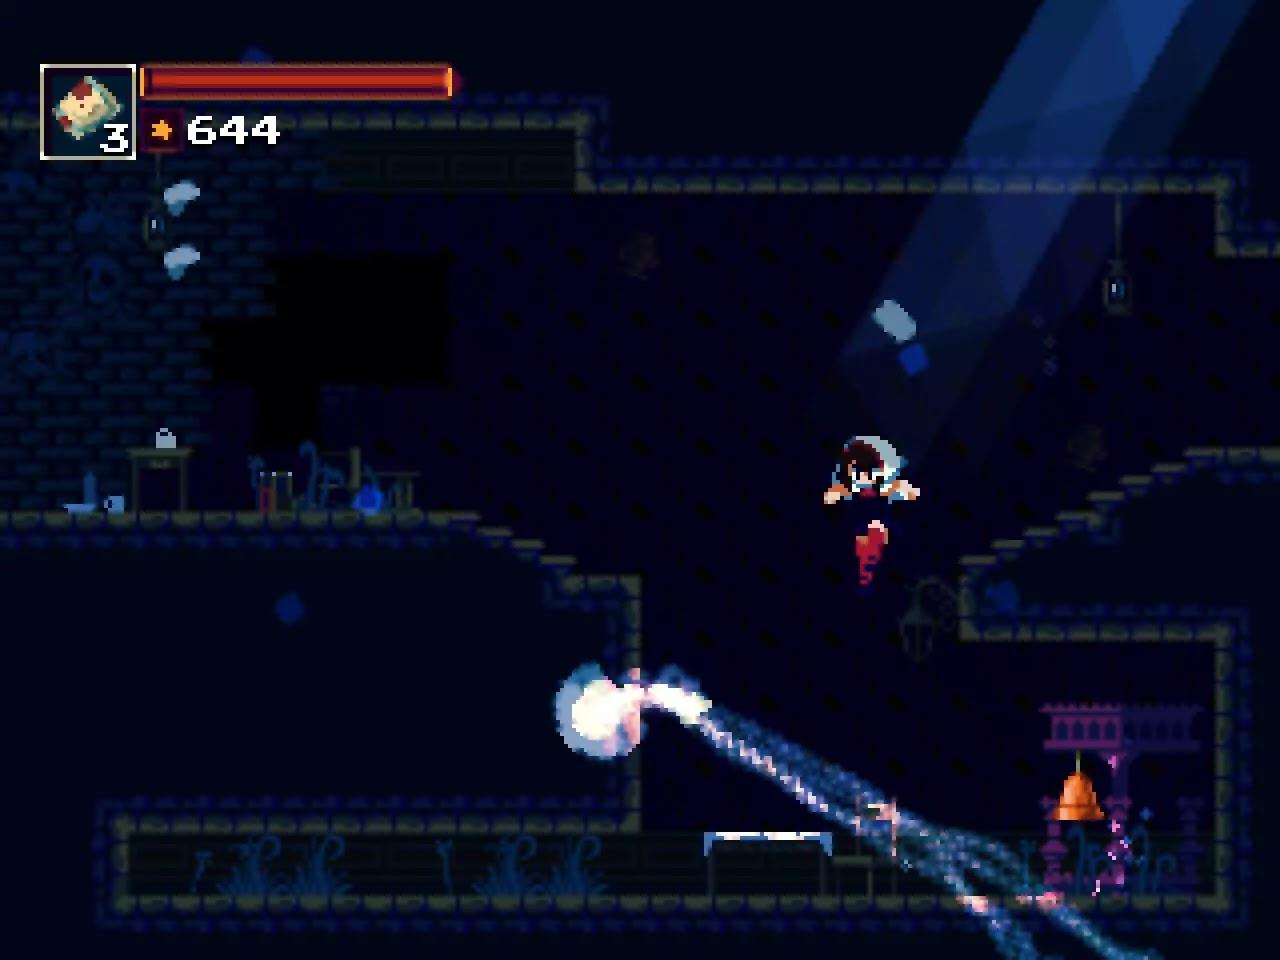 Momodora Reverie Under the Moonlight game images